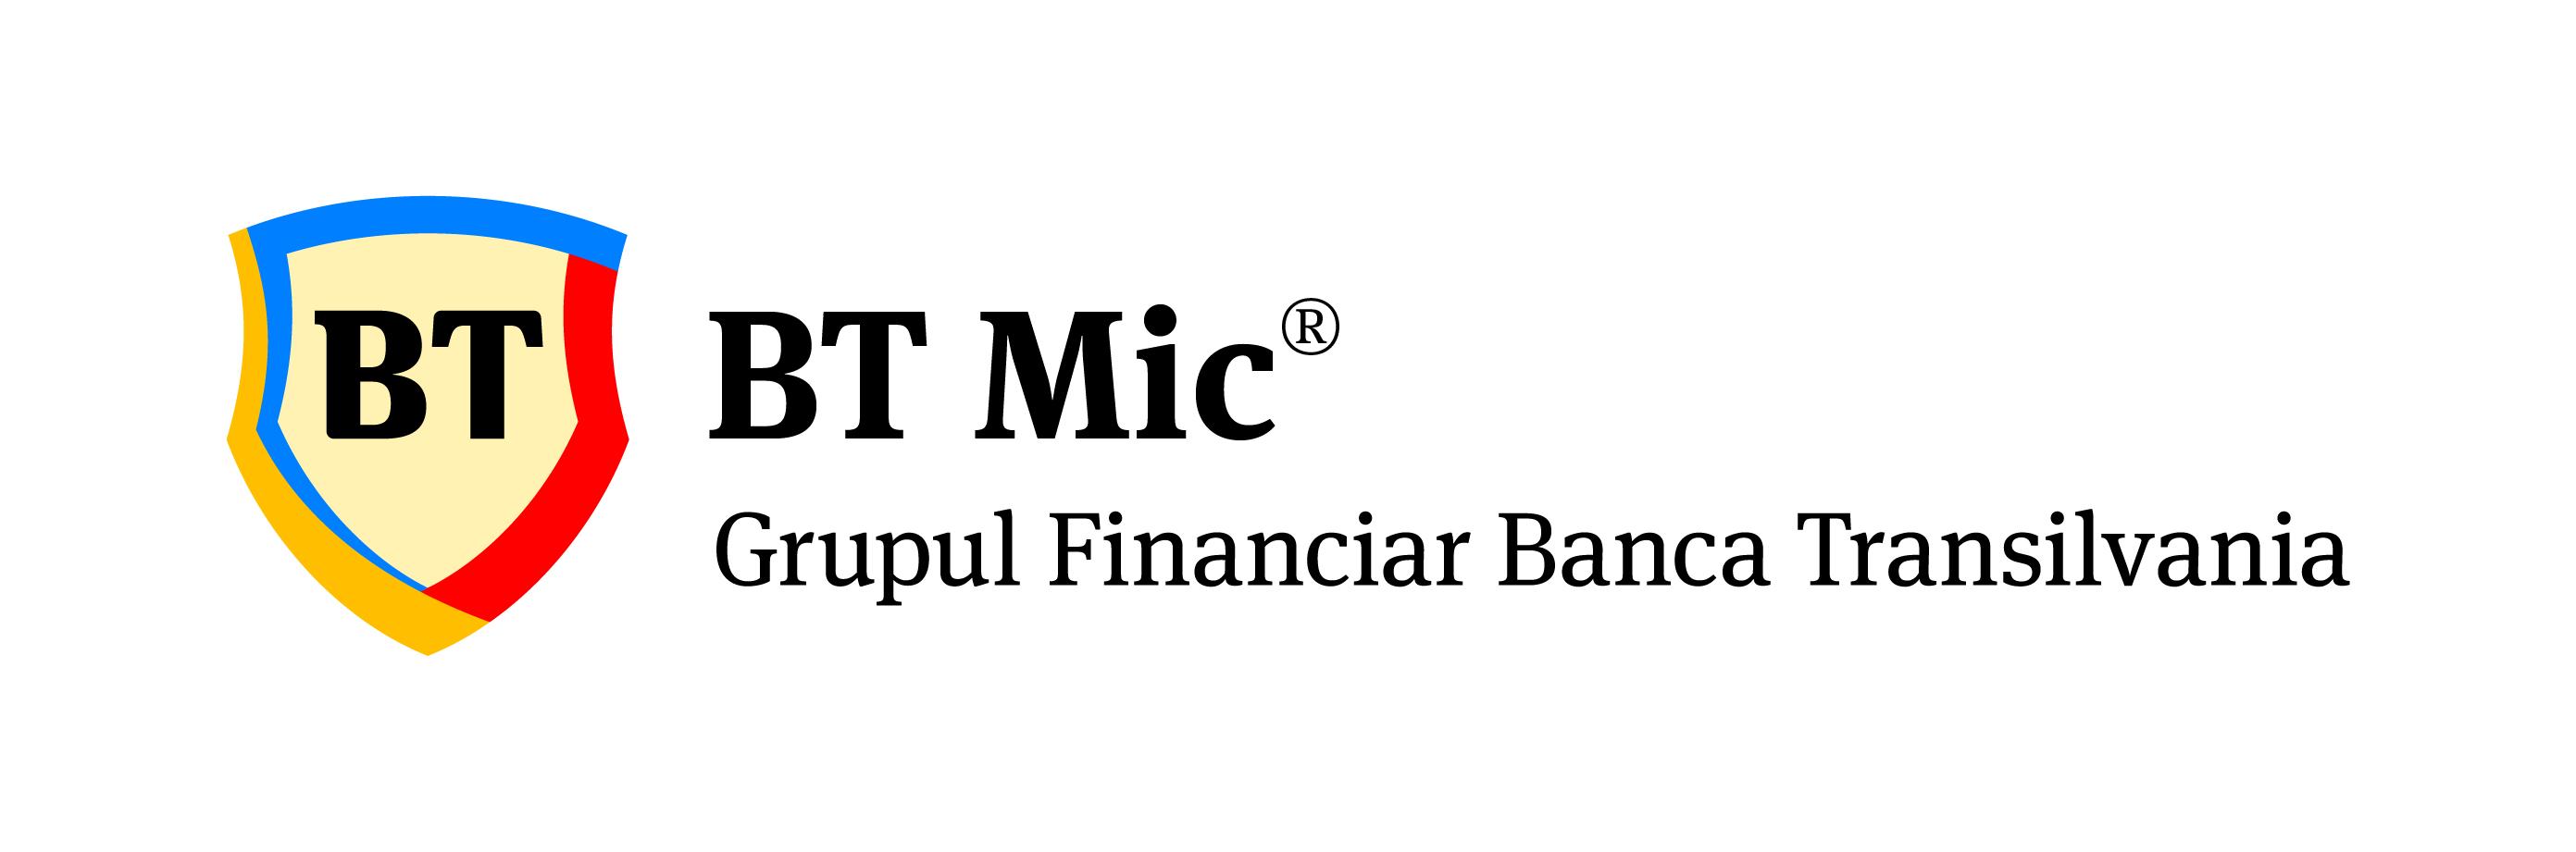 Bt Microfinanțare Ifn S.a.